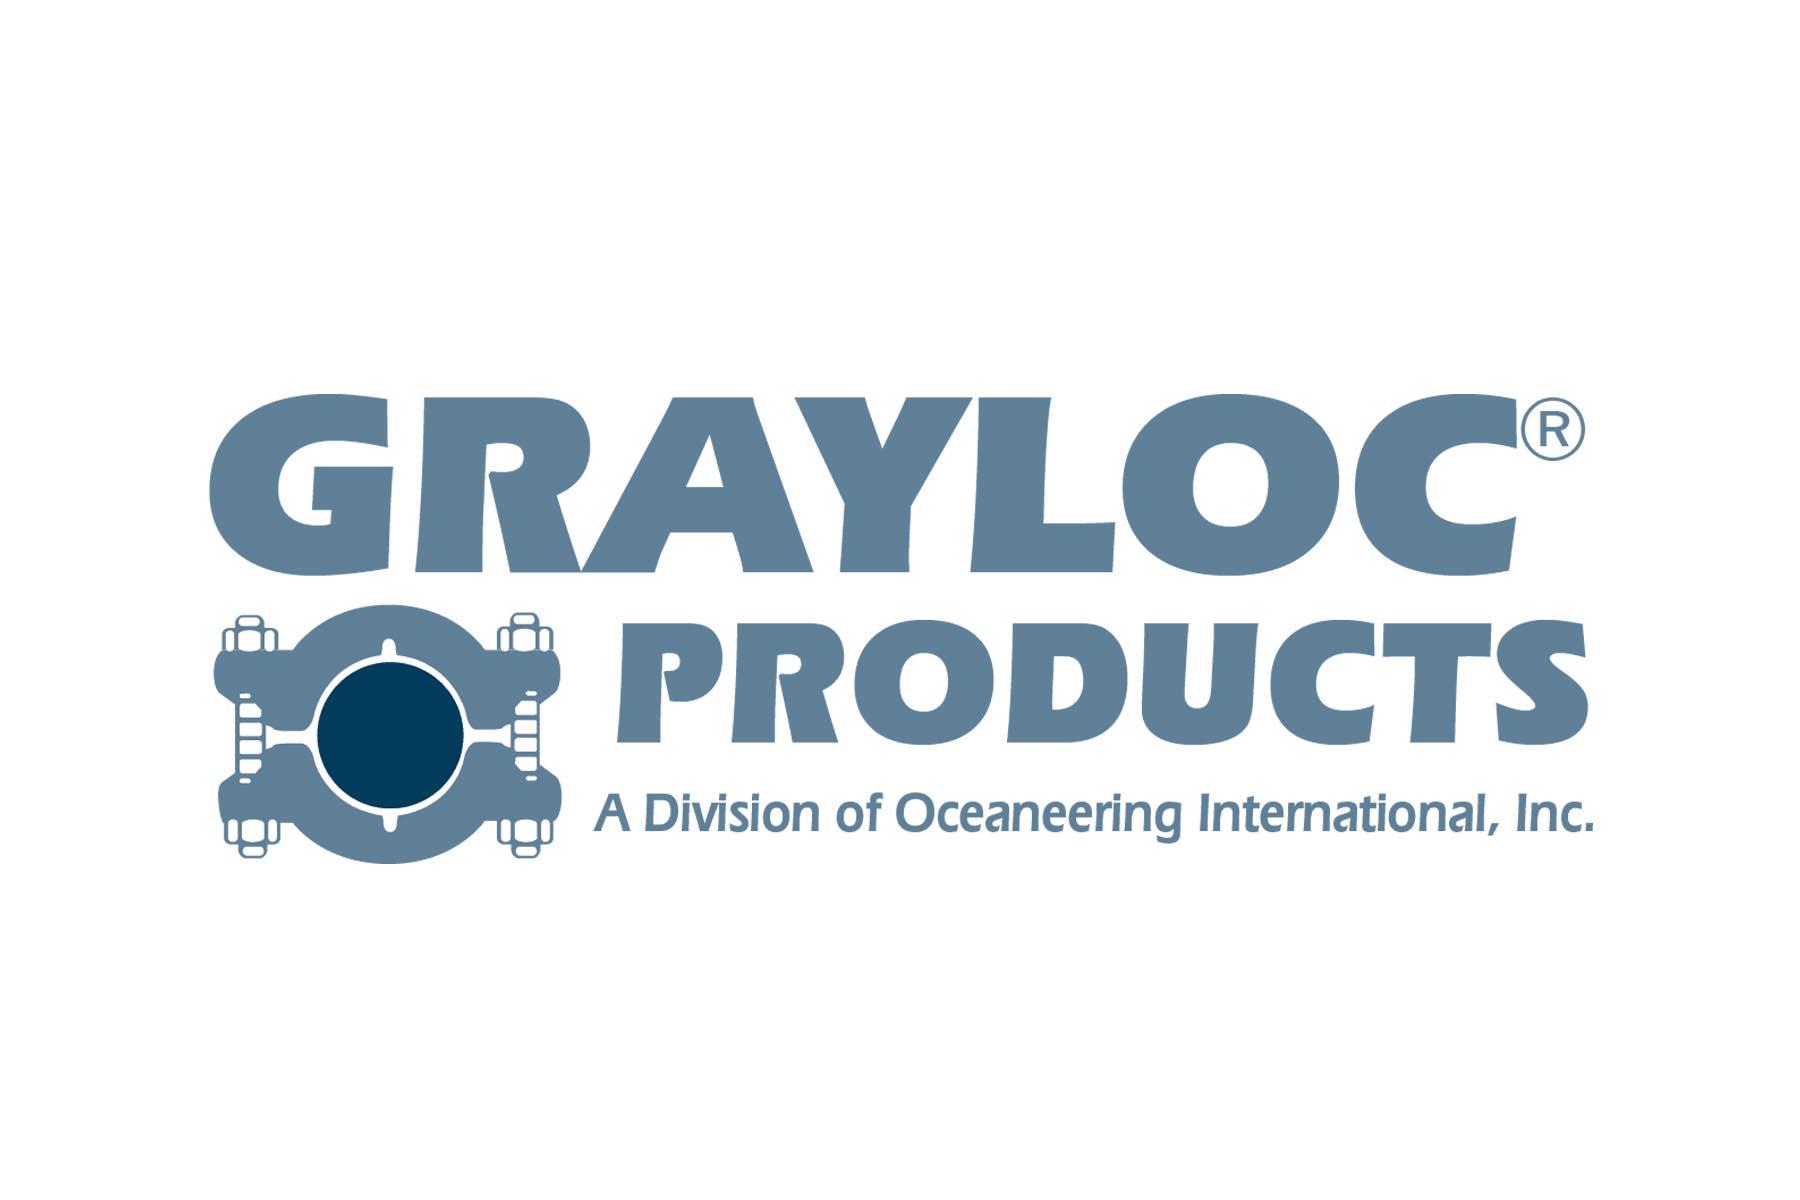 Grayloc